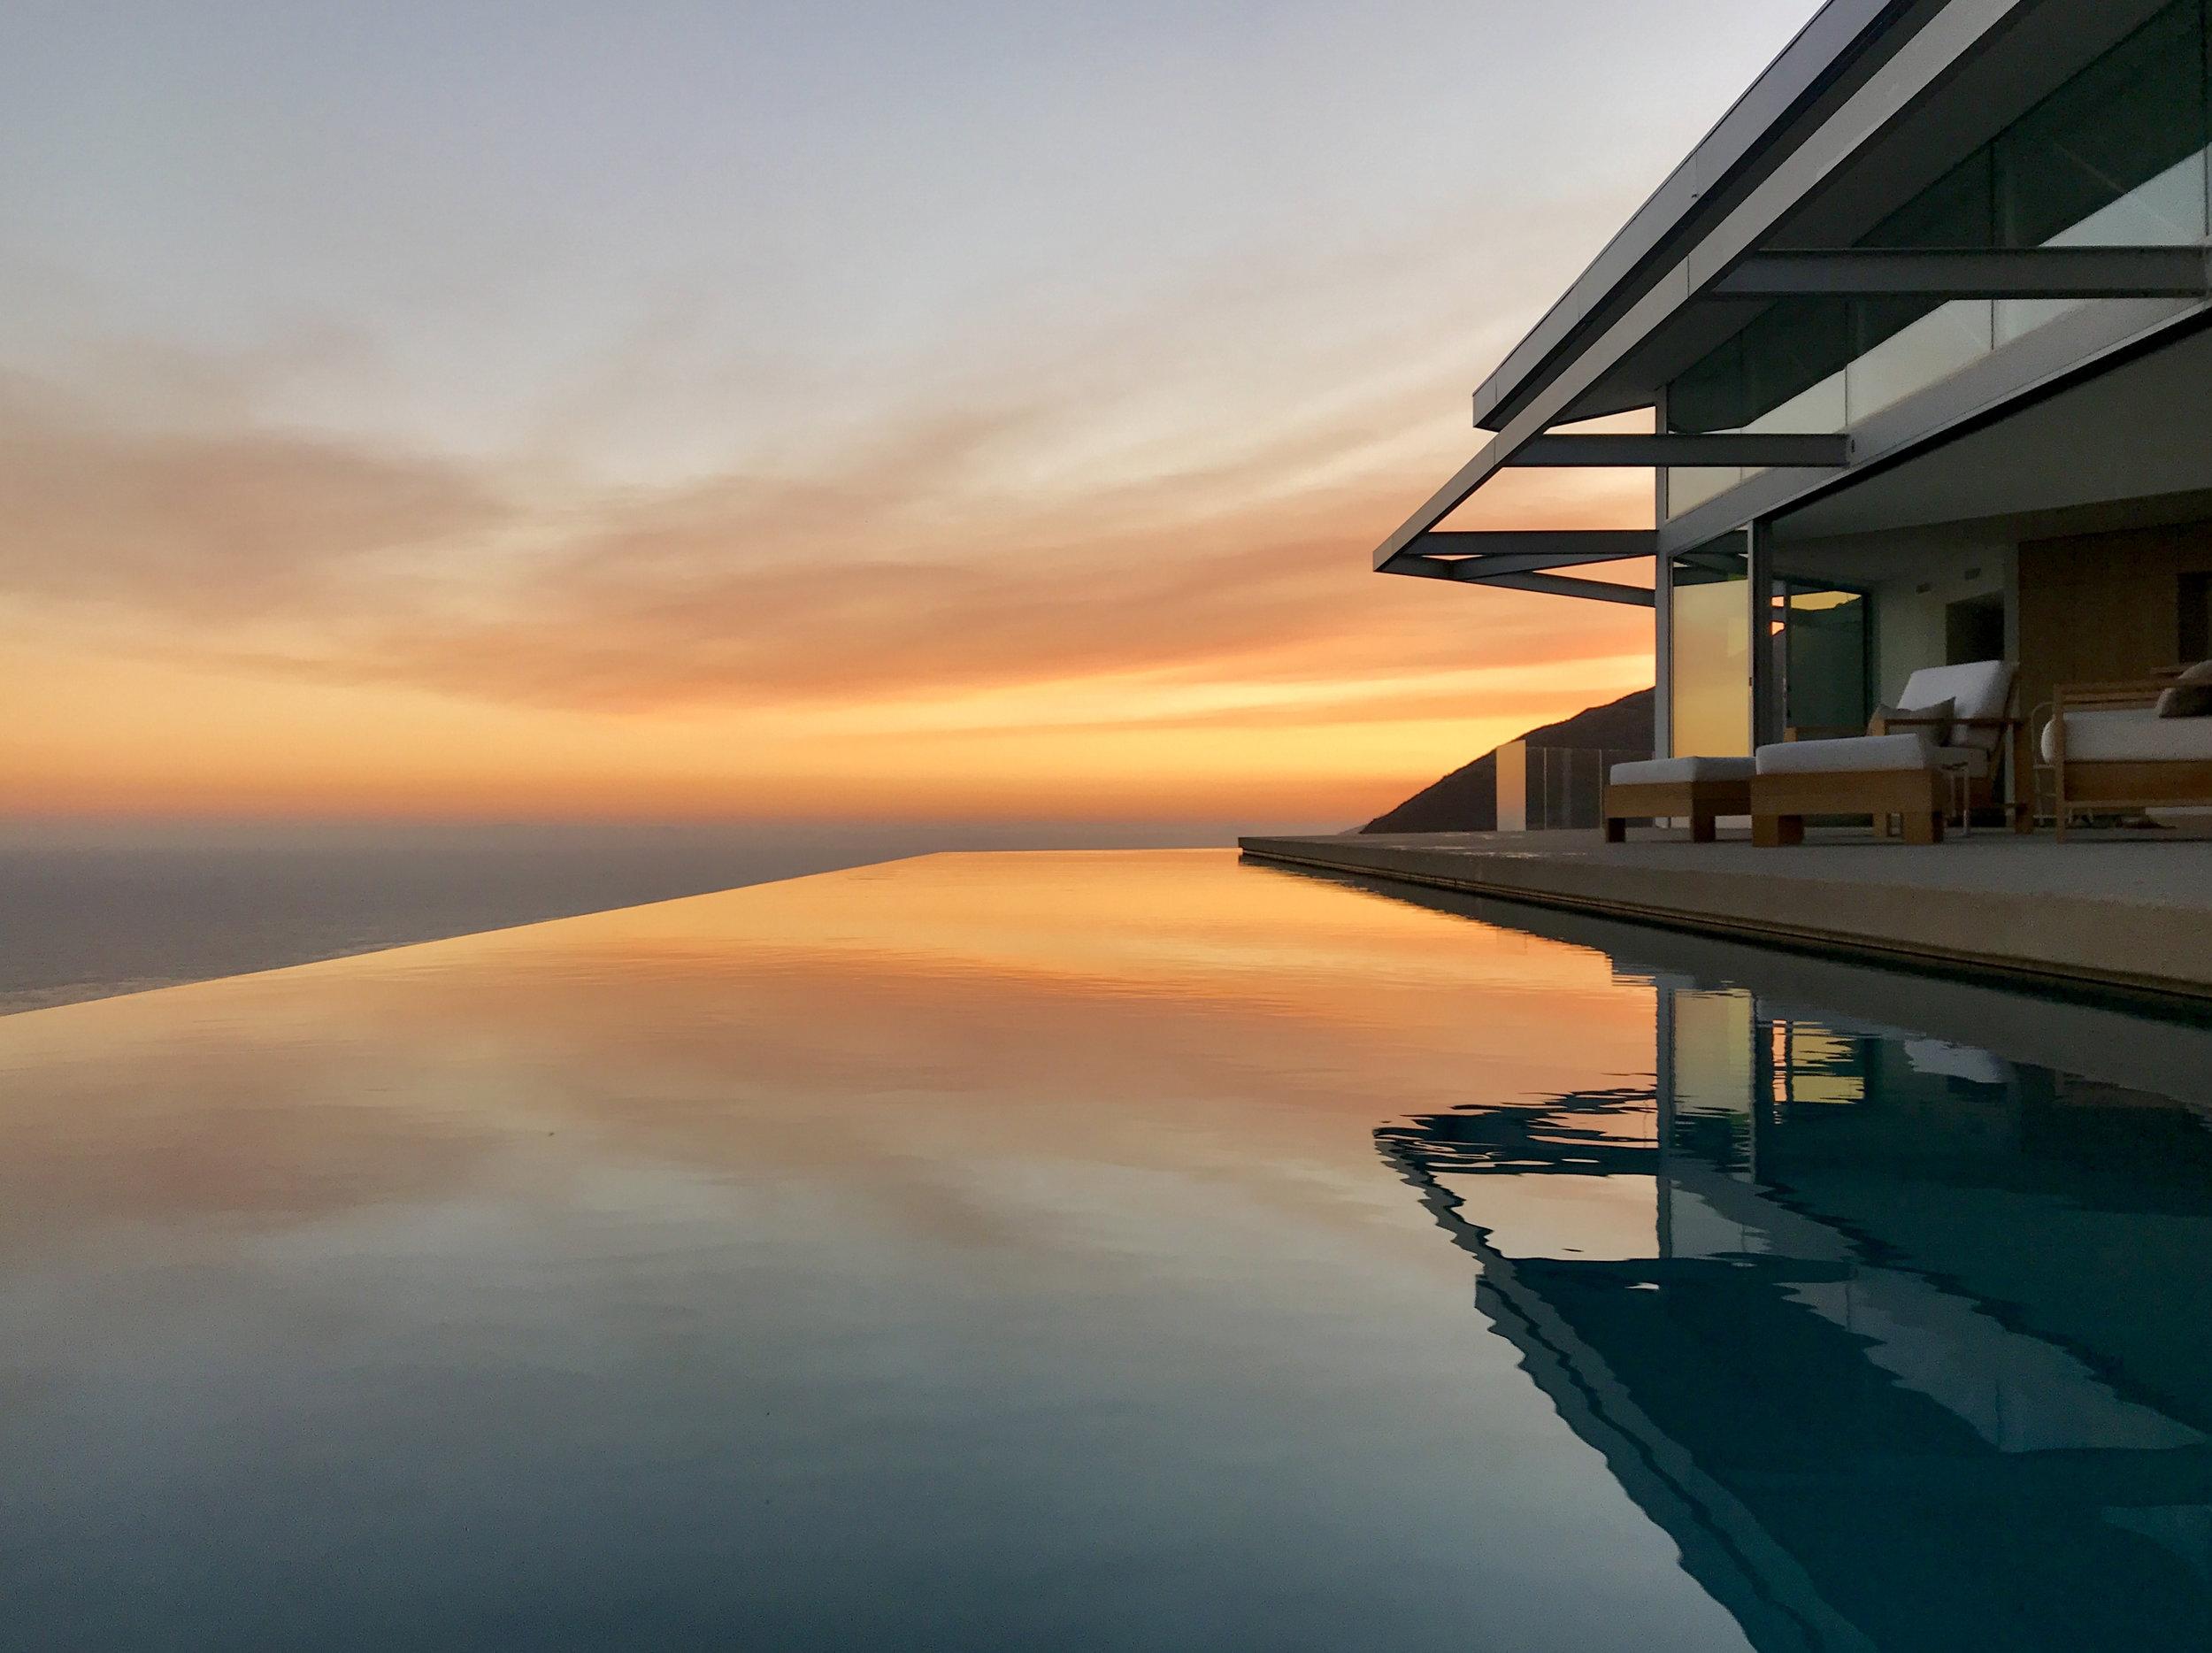 Horizon_House_GvOD_Cover_Image.jpg